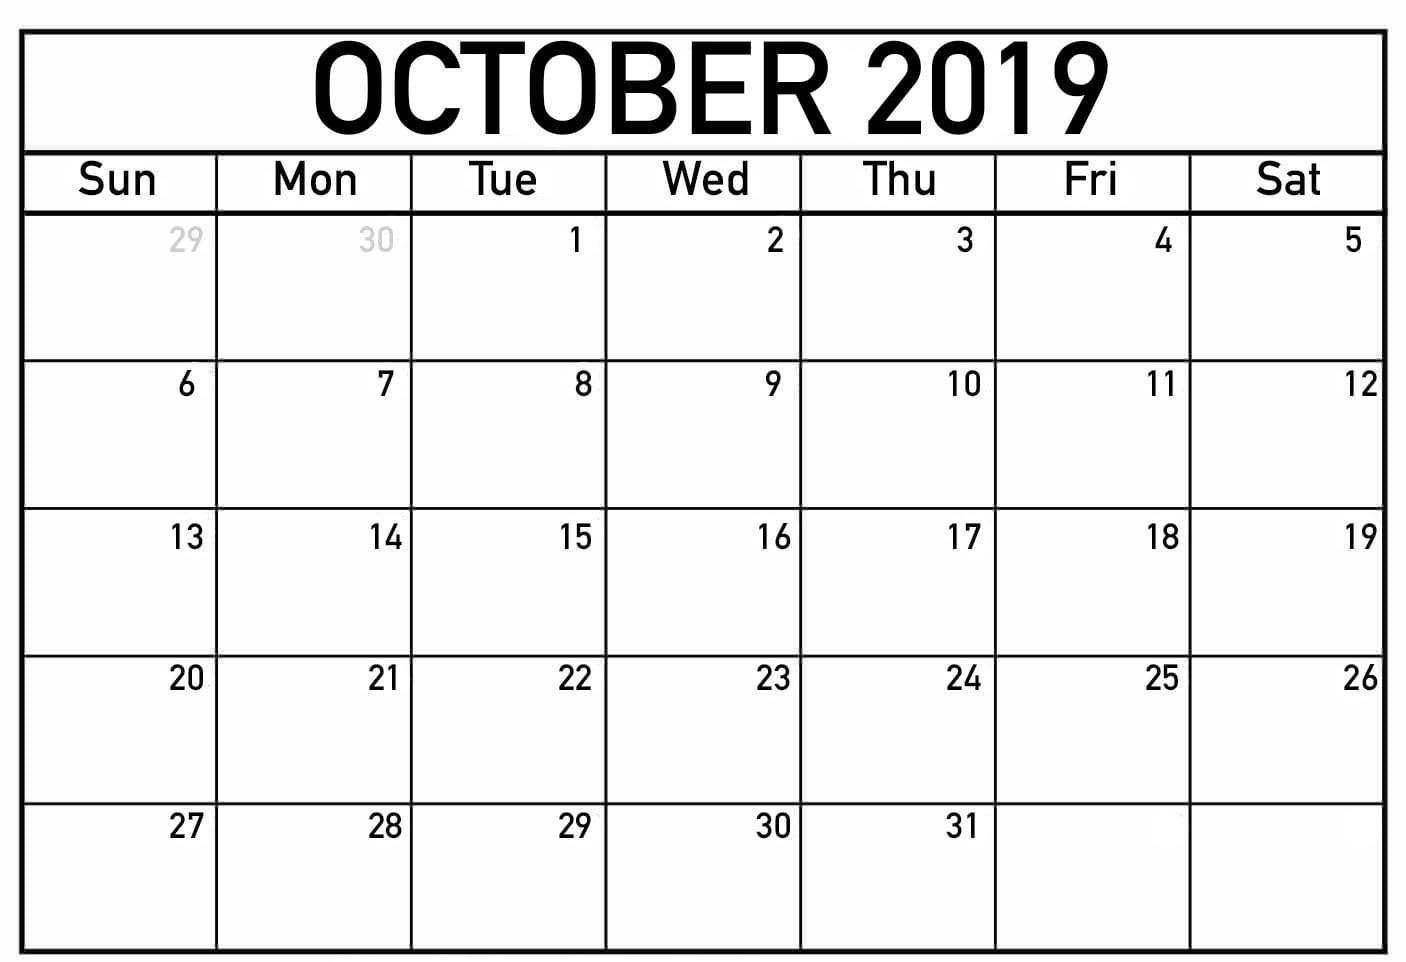 Printable Fillable Calendar For October 2019 | October within Printable Fill In Calendar 2019